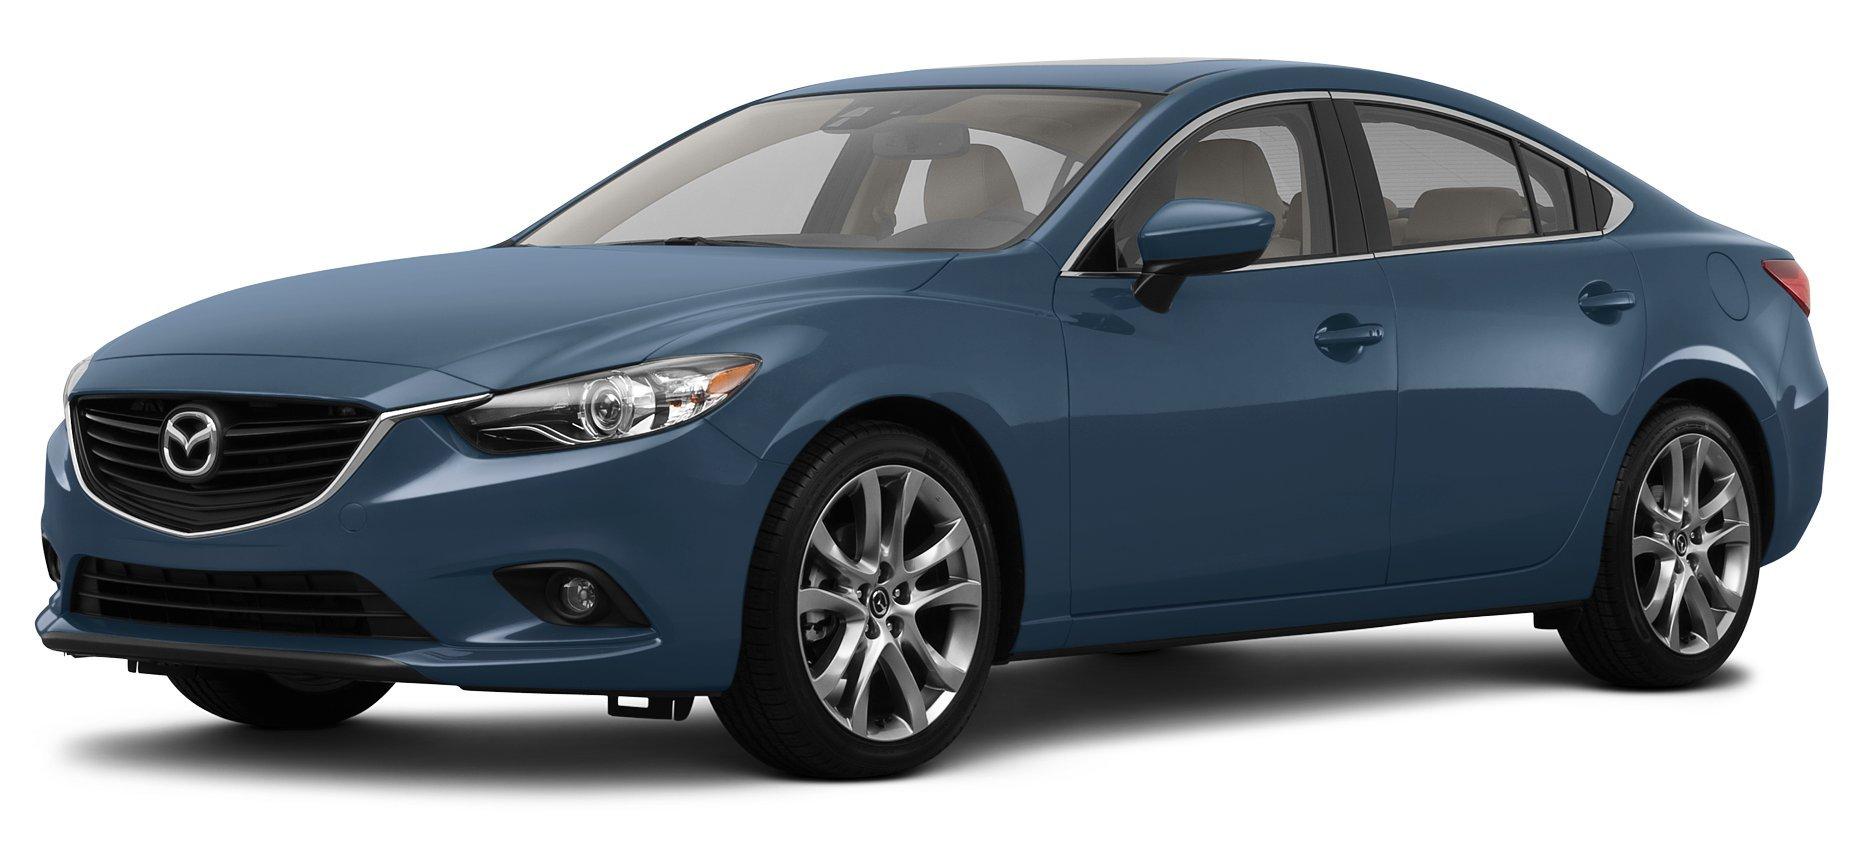 2014 Mazda 6 I Grand Touring, 4 Door Sedan Automatic Transmission ...